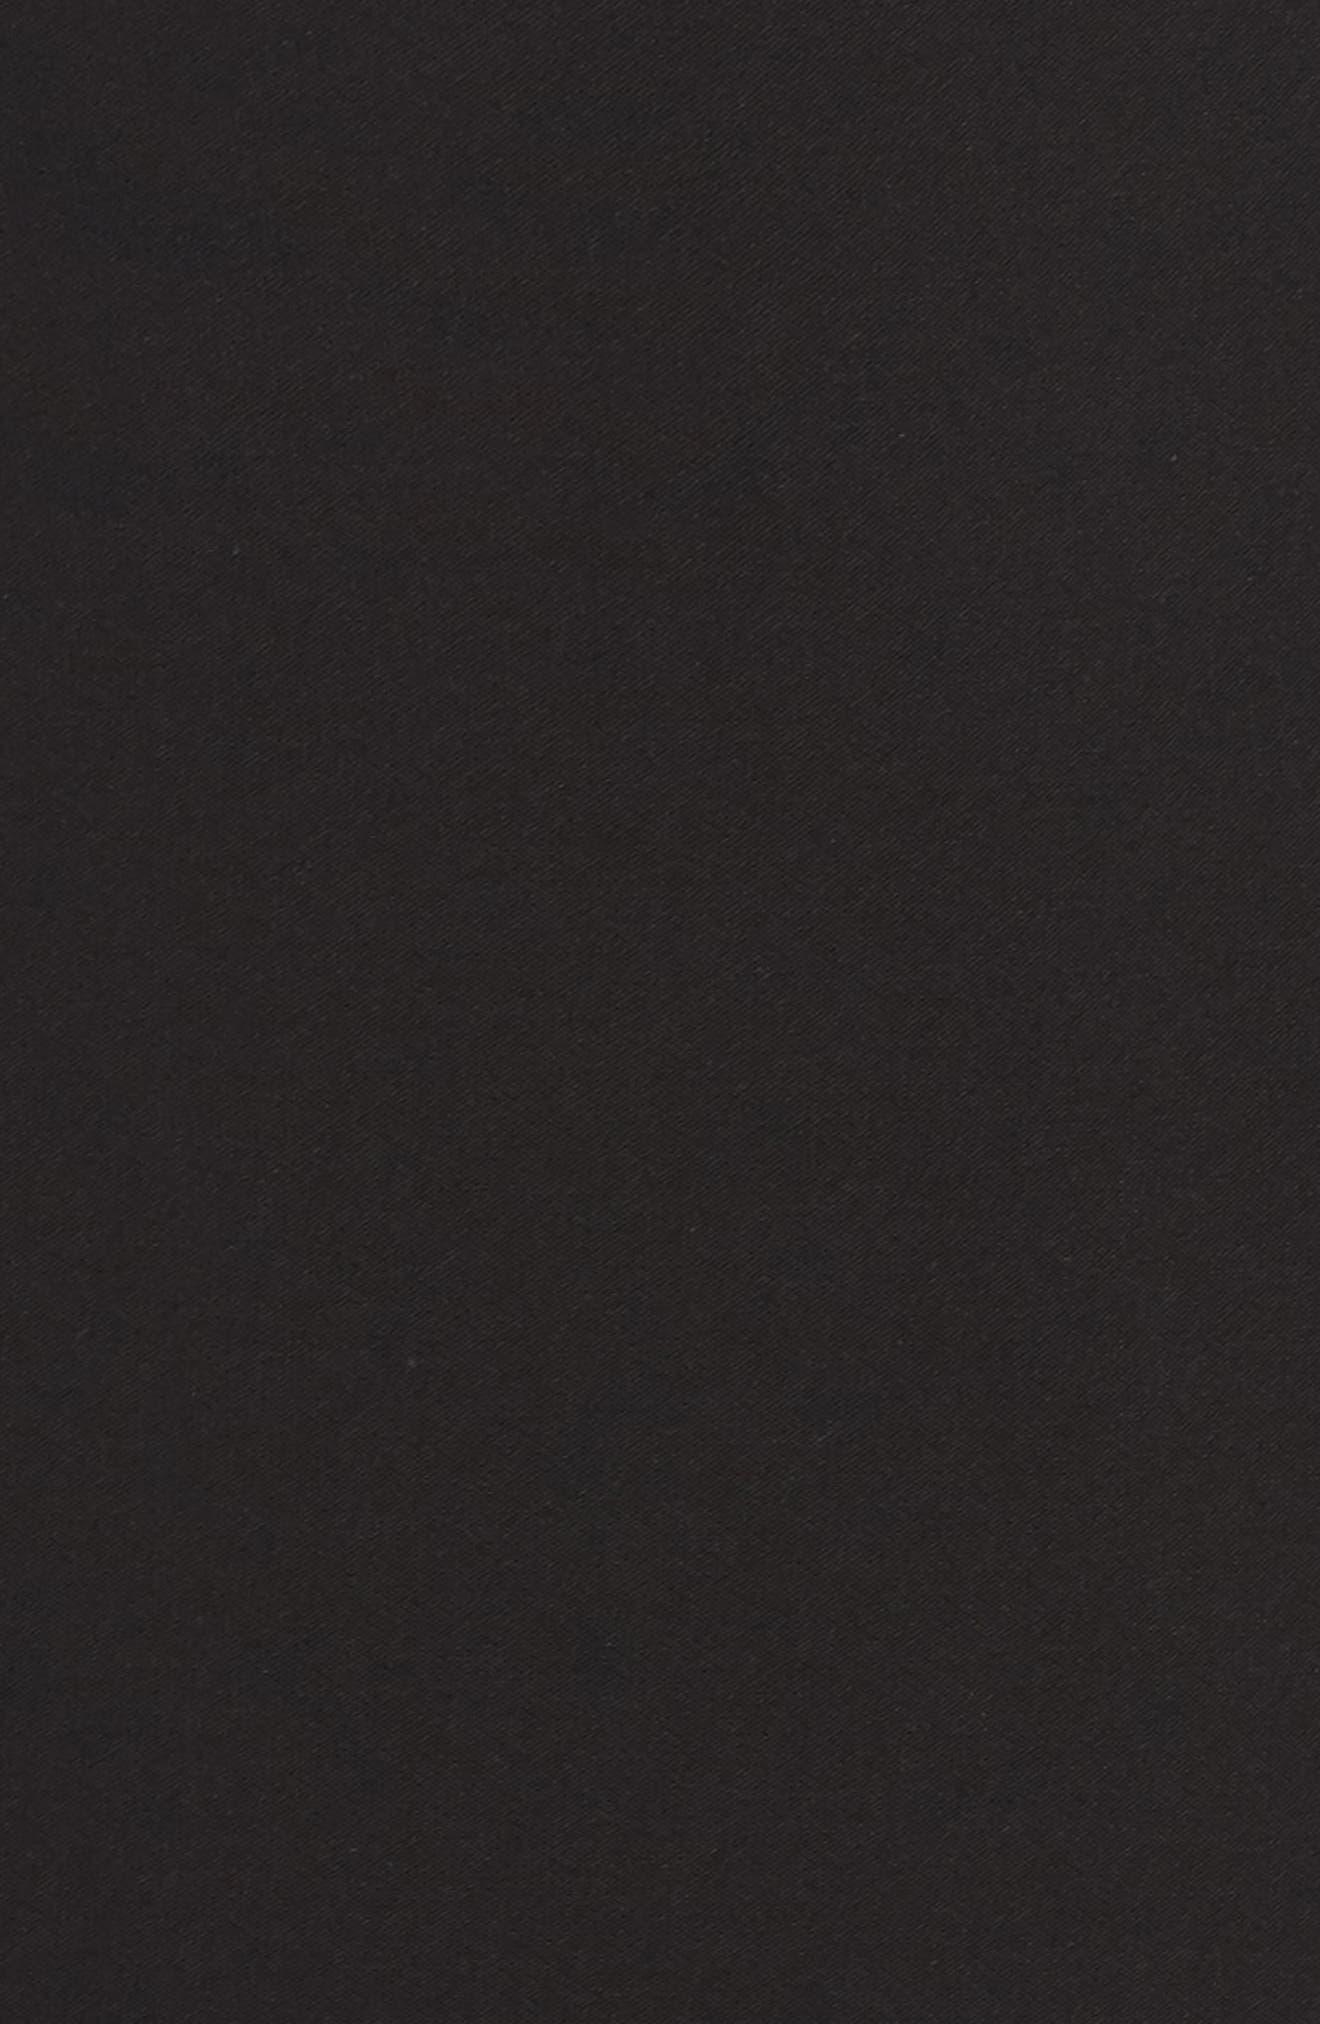 Off the Shoulder Bell Sleeve Sheath Dress,                             Alternate thumbnail 5, color,                             Black